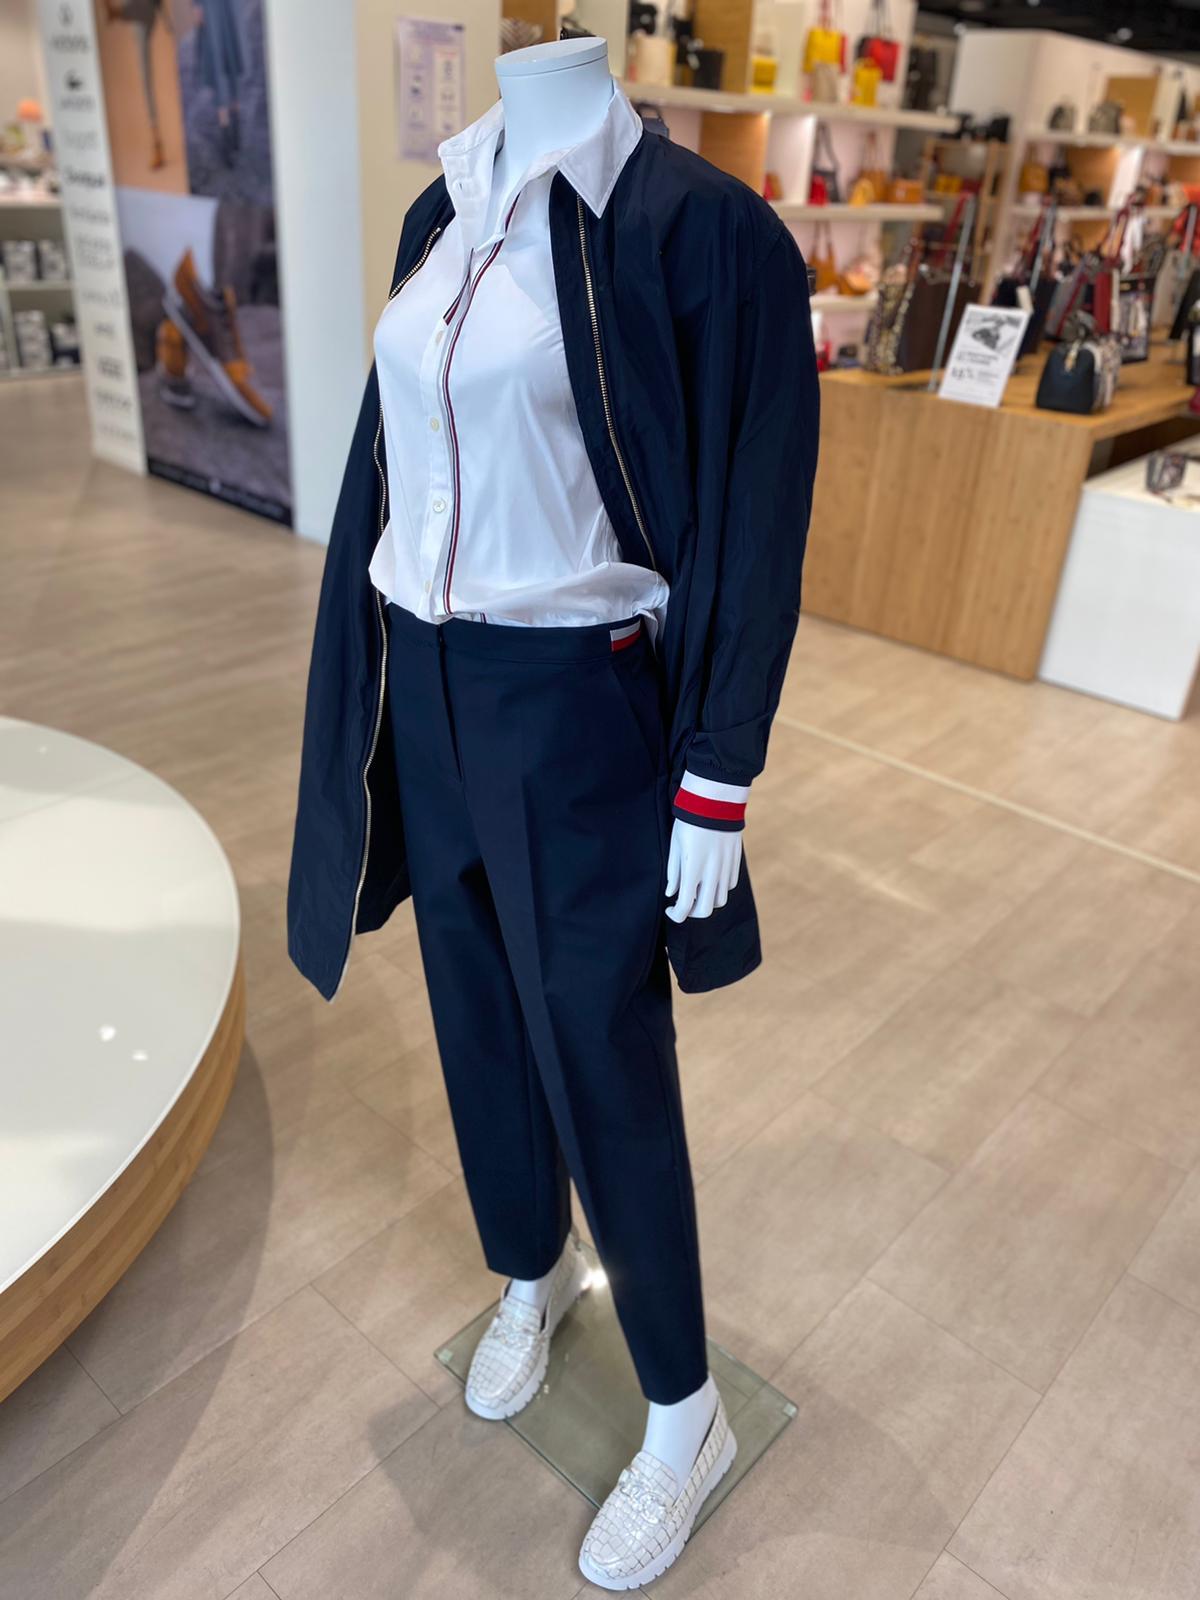 Tommy Hilfiger - Chemise blanche 109€ -Veste Marine 199€ - Chaussures Wonders 125€